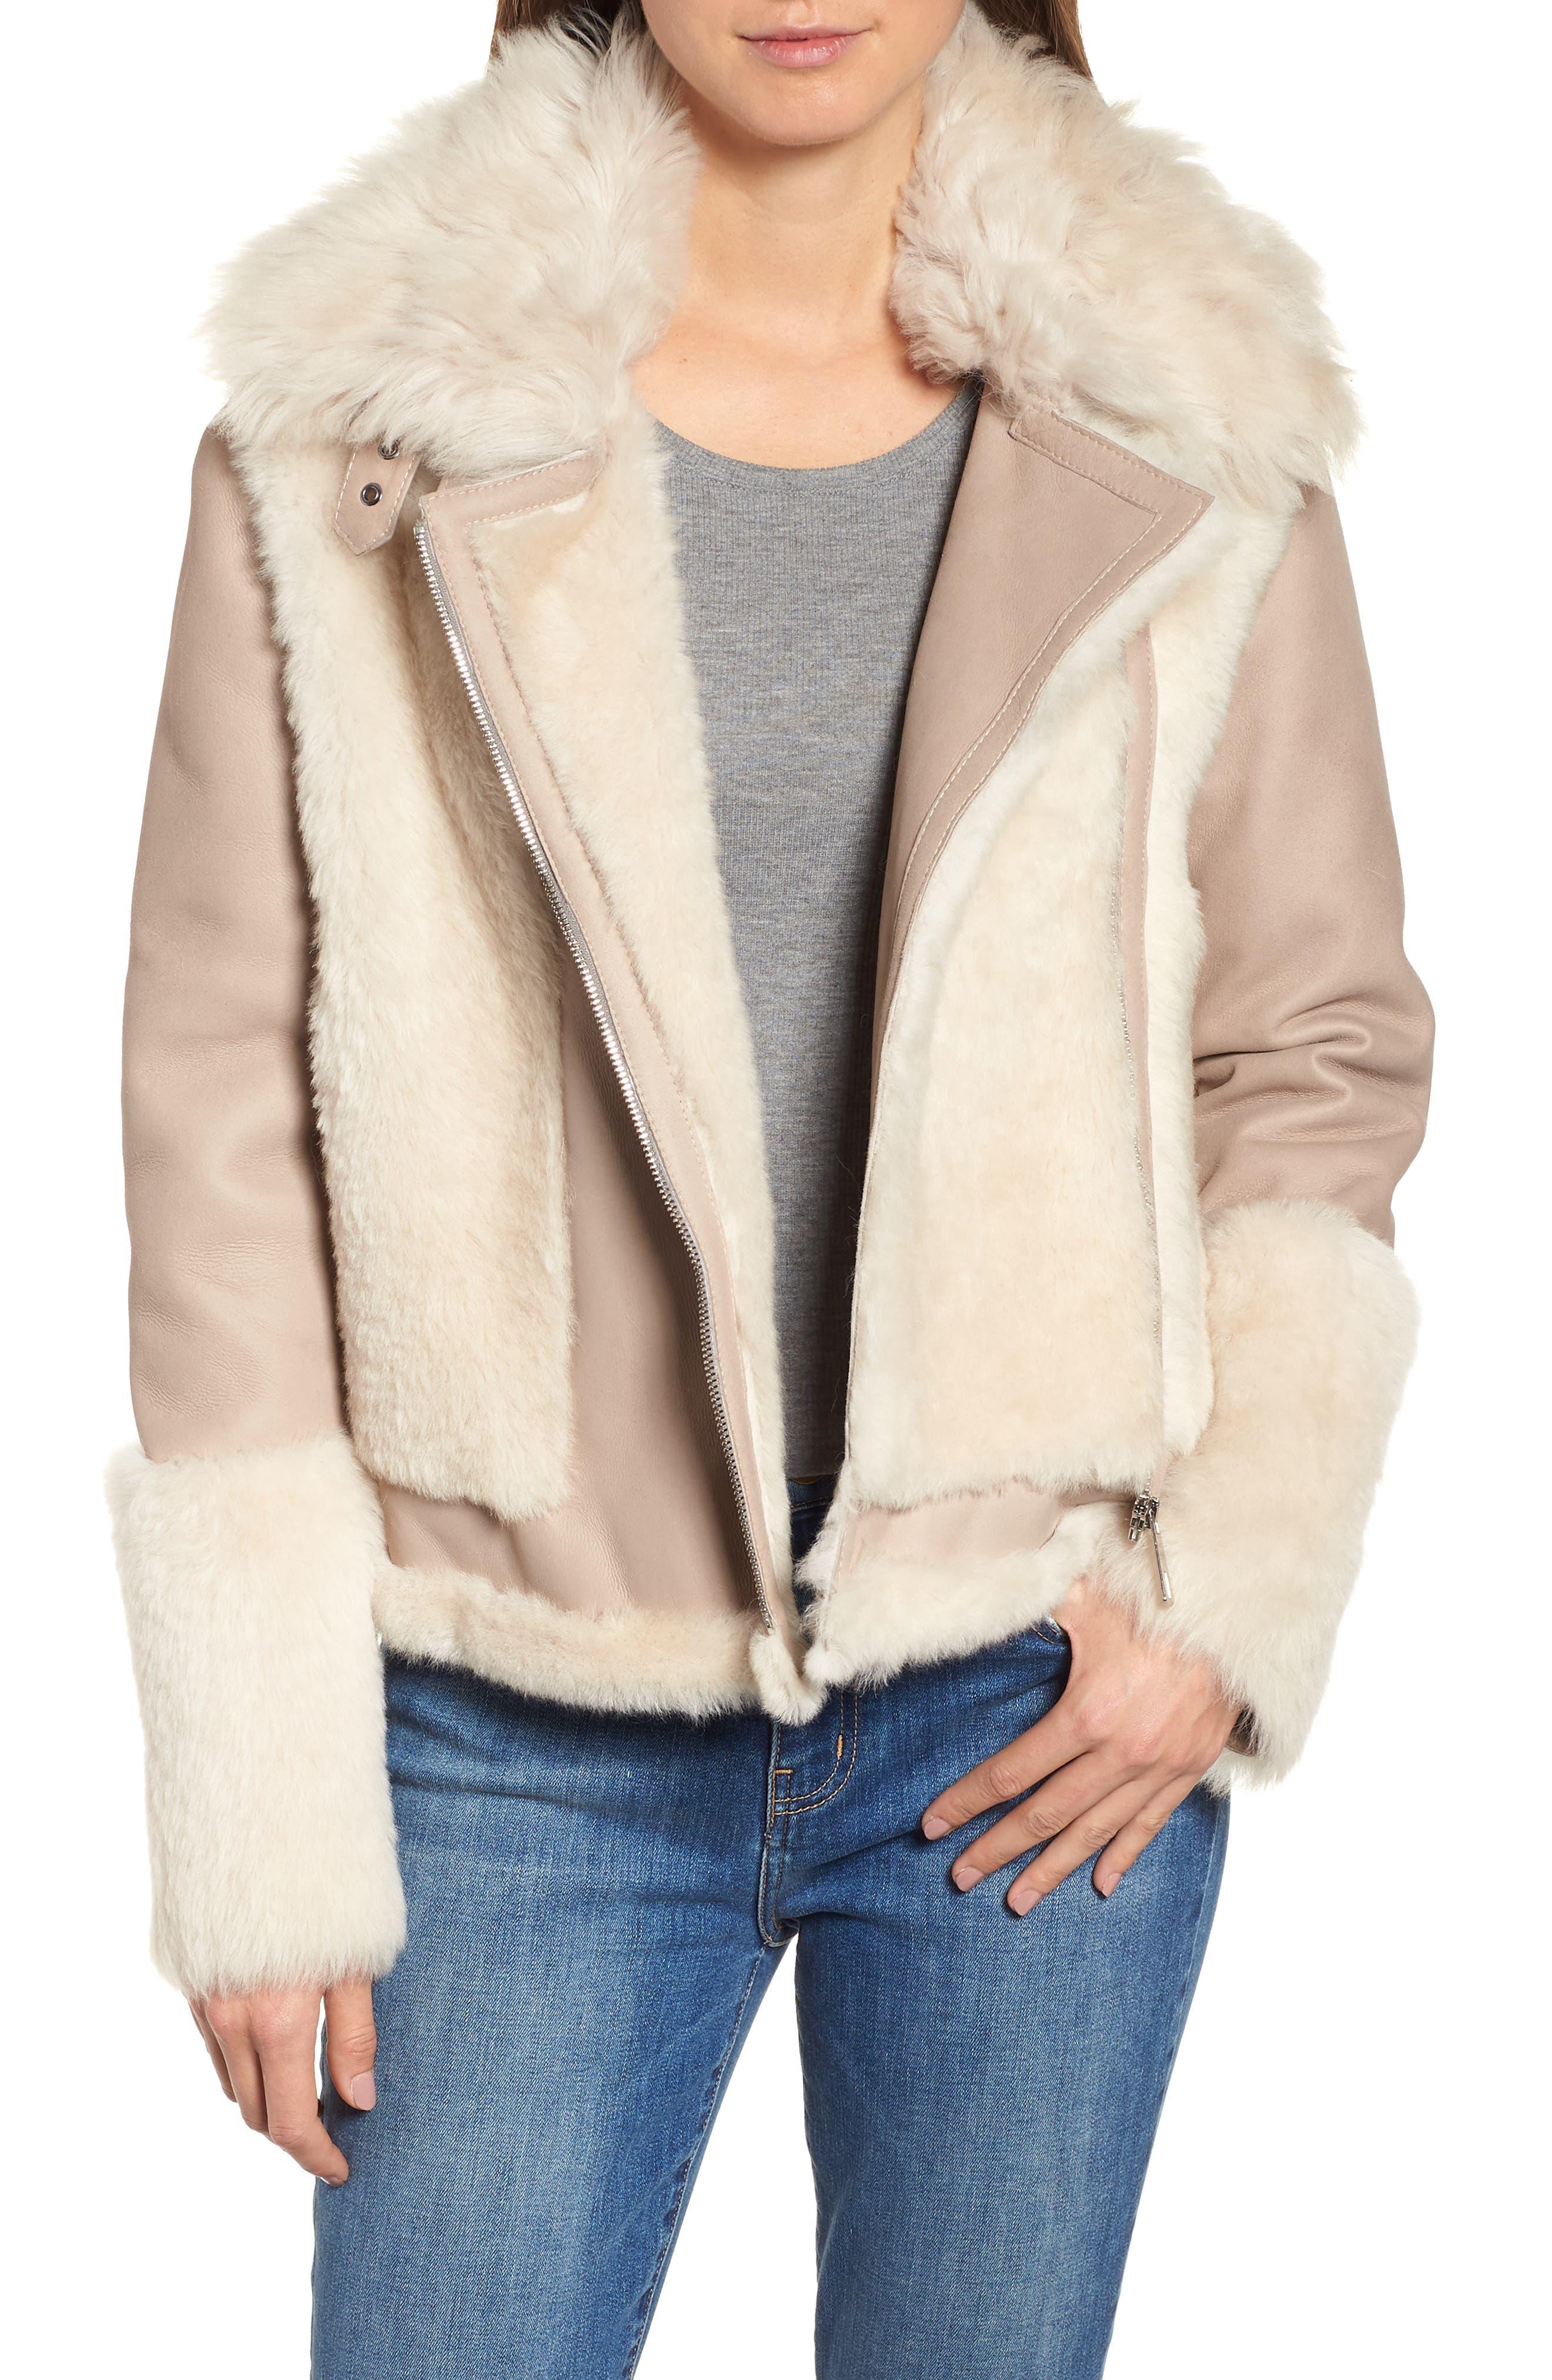 Hiso Genuine Toscana Shearling Jacket, Beige